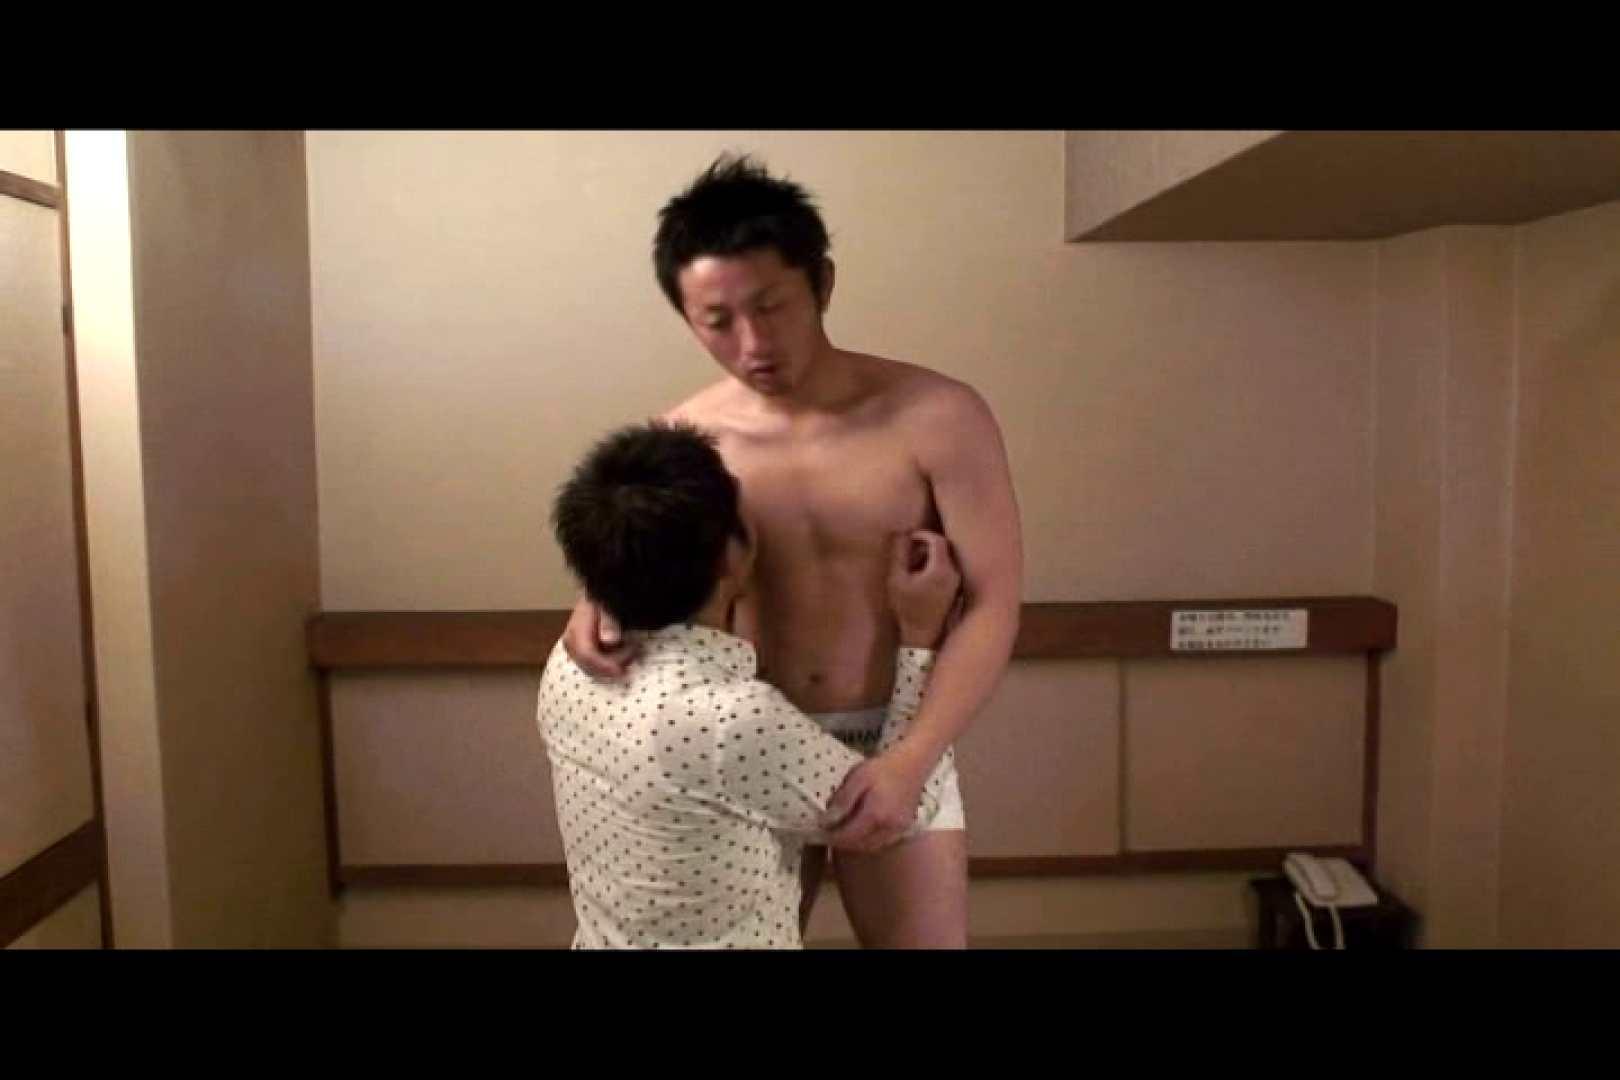 Bistro「イケメン」~Mokkori和風仕立て~vol.01 男同士のプレイ | イケメンのセックス  11枚 6